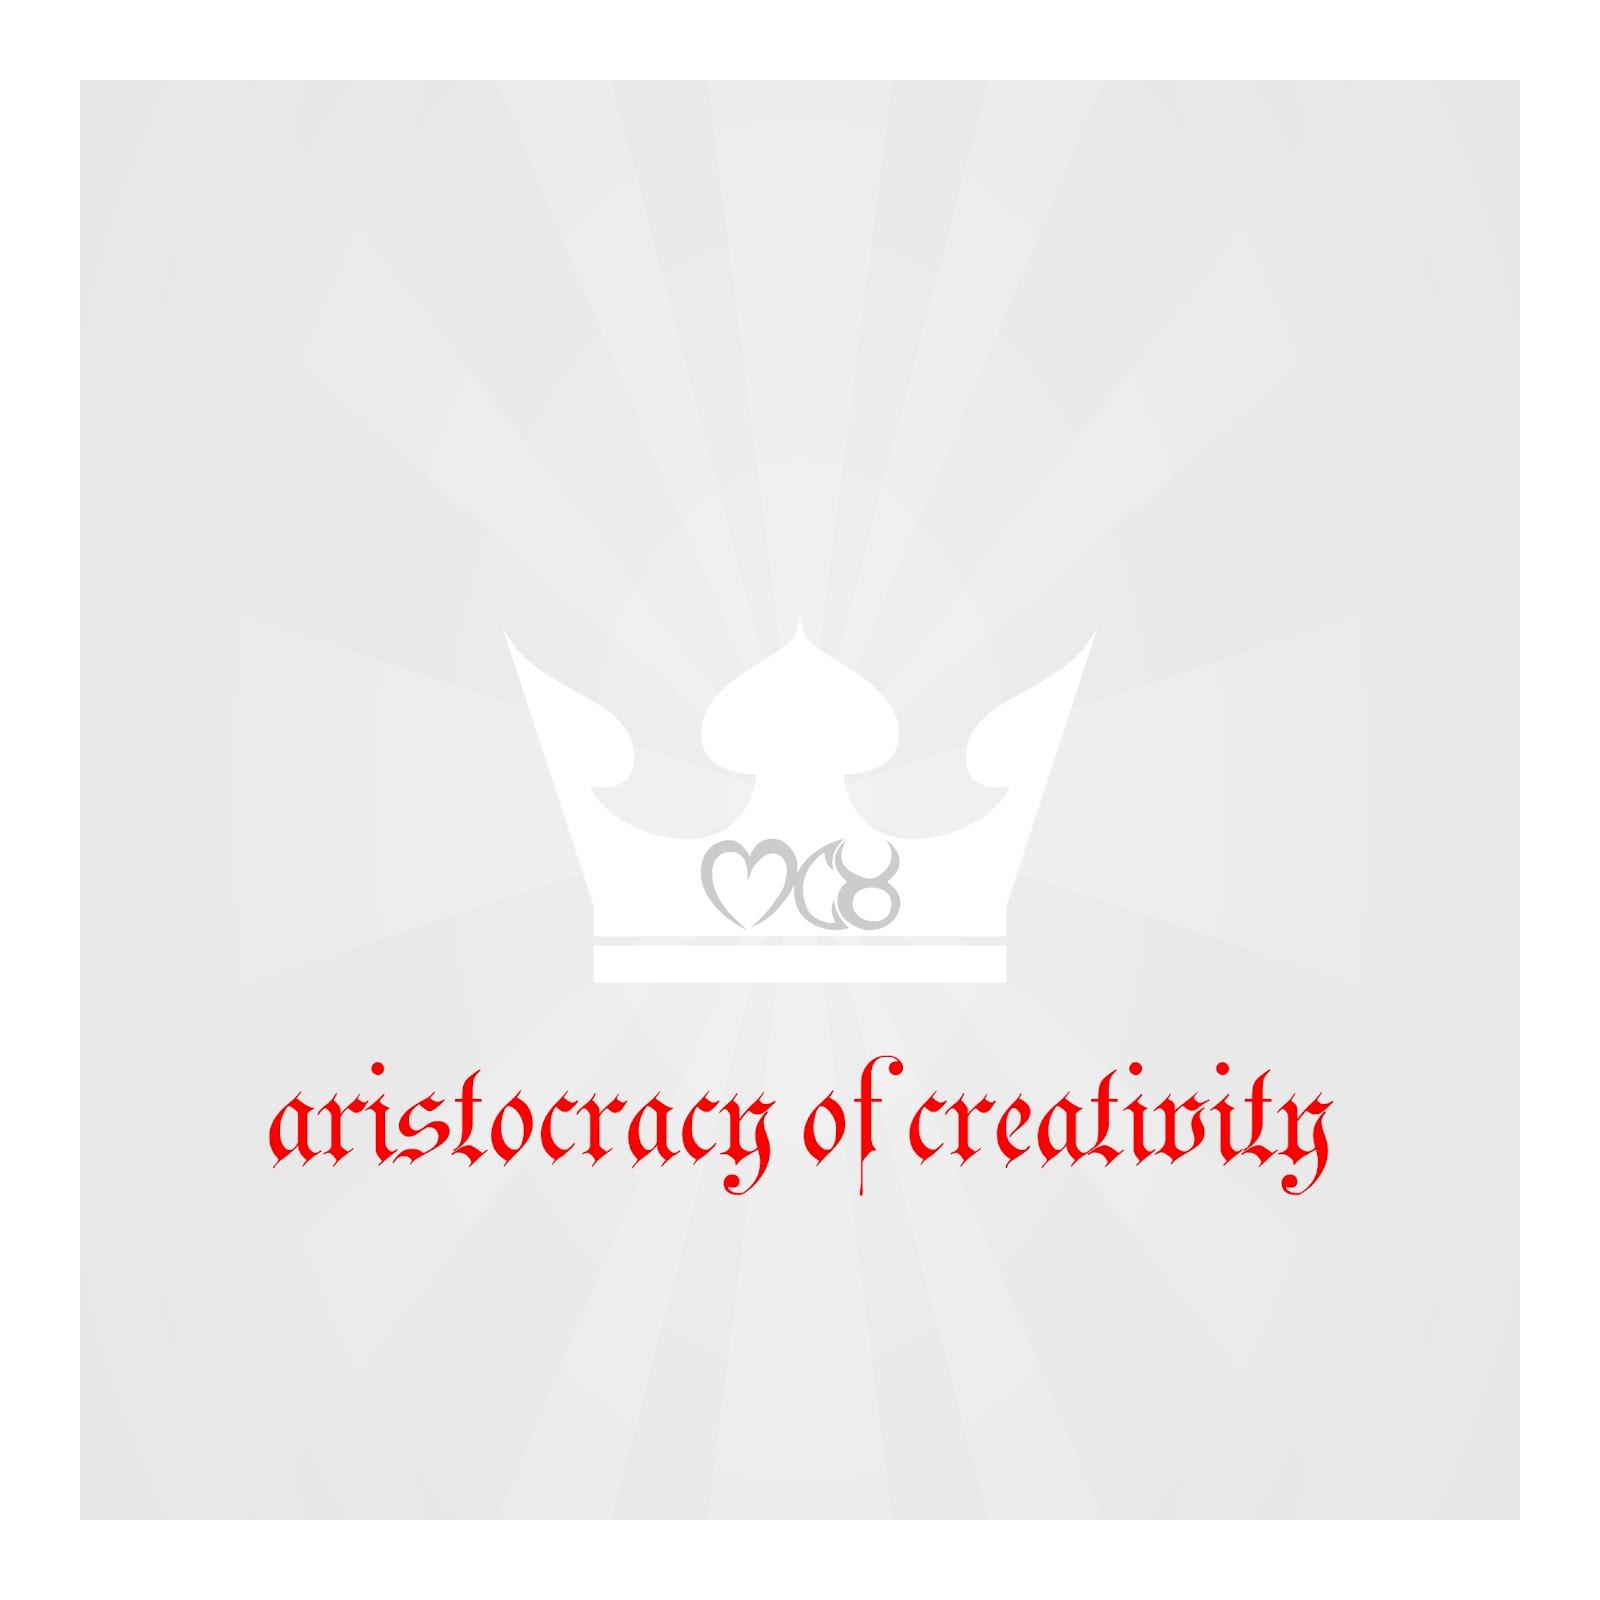 Aristocracy of Creativity